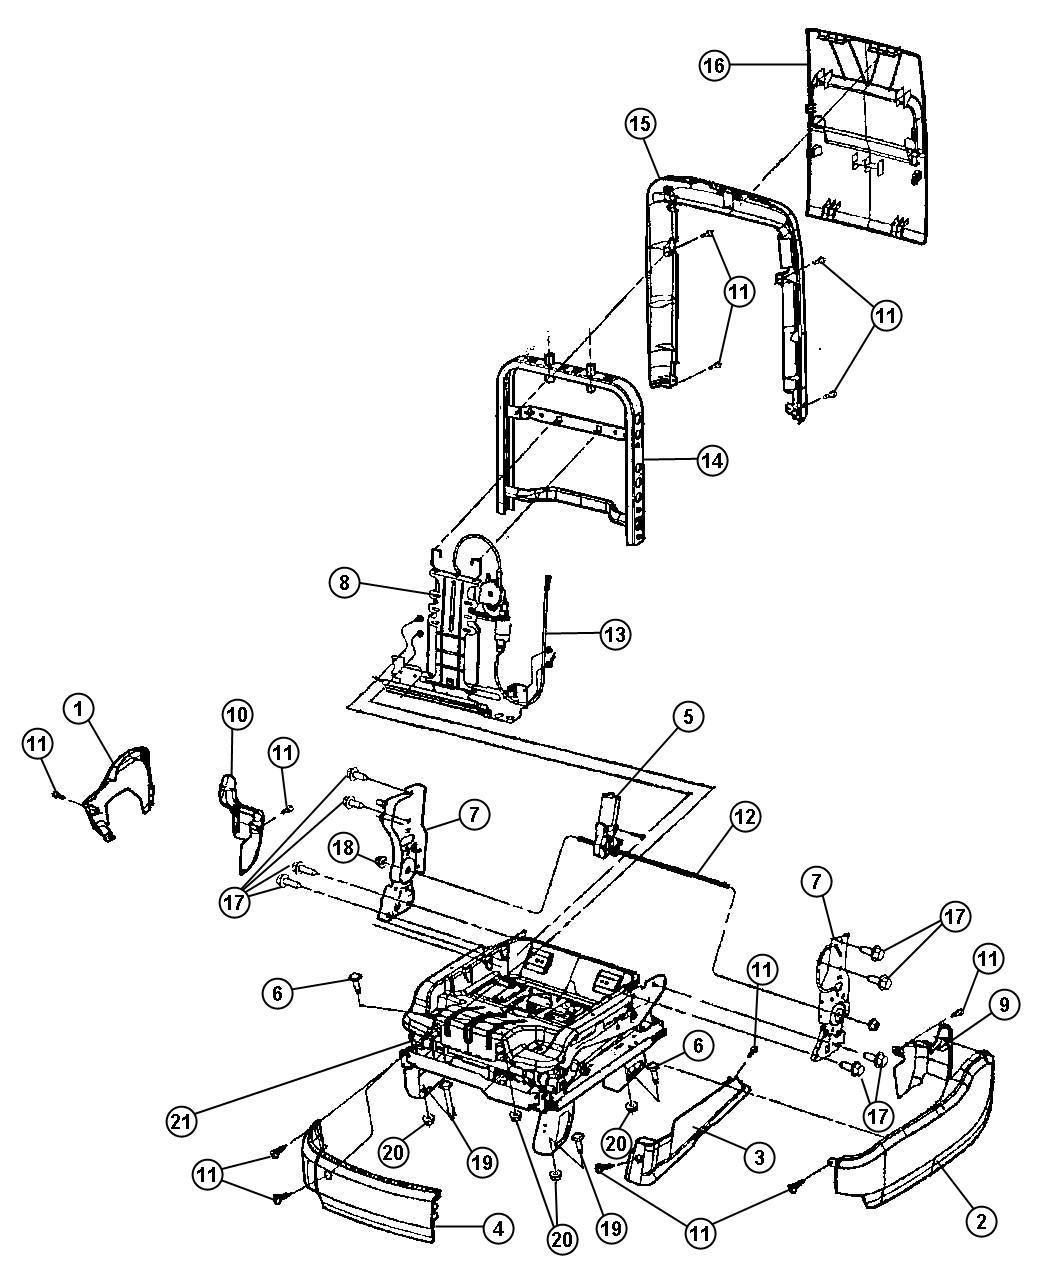 Jeep Grand Cherokee Motor Seat Recliner Power Seat Trim